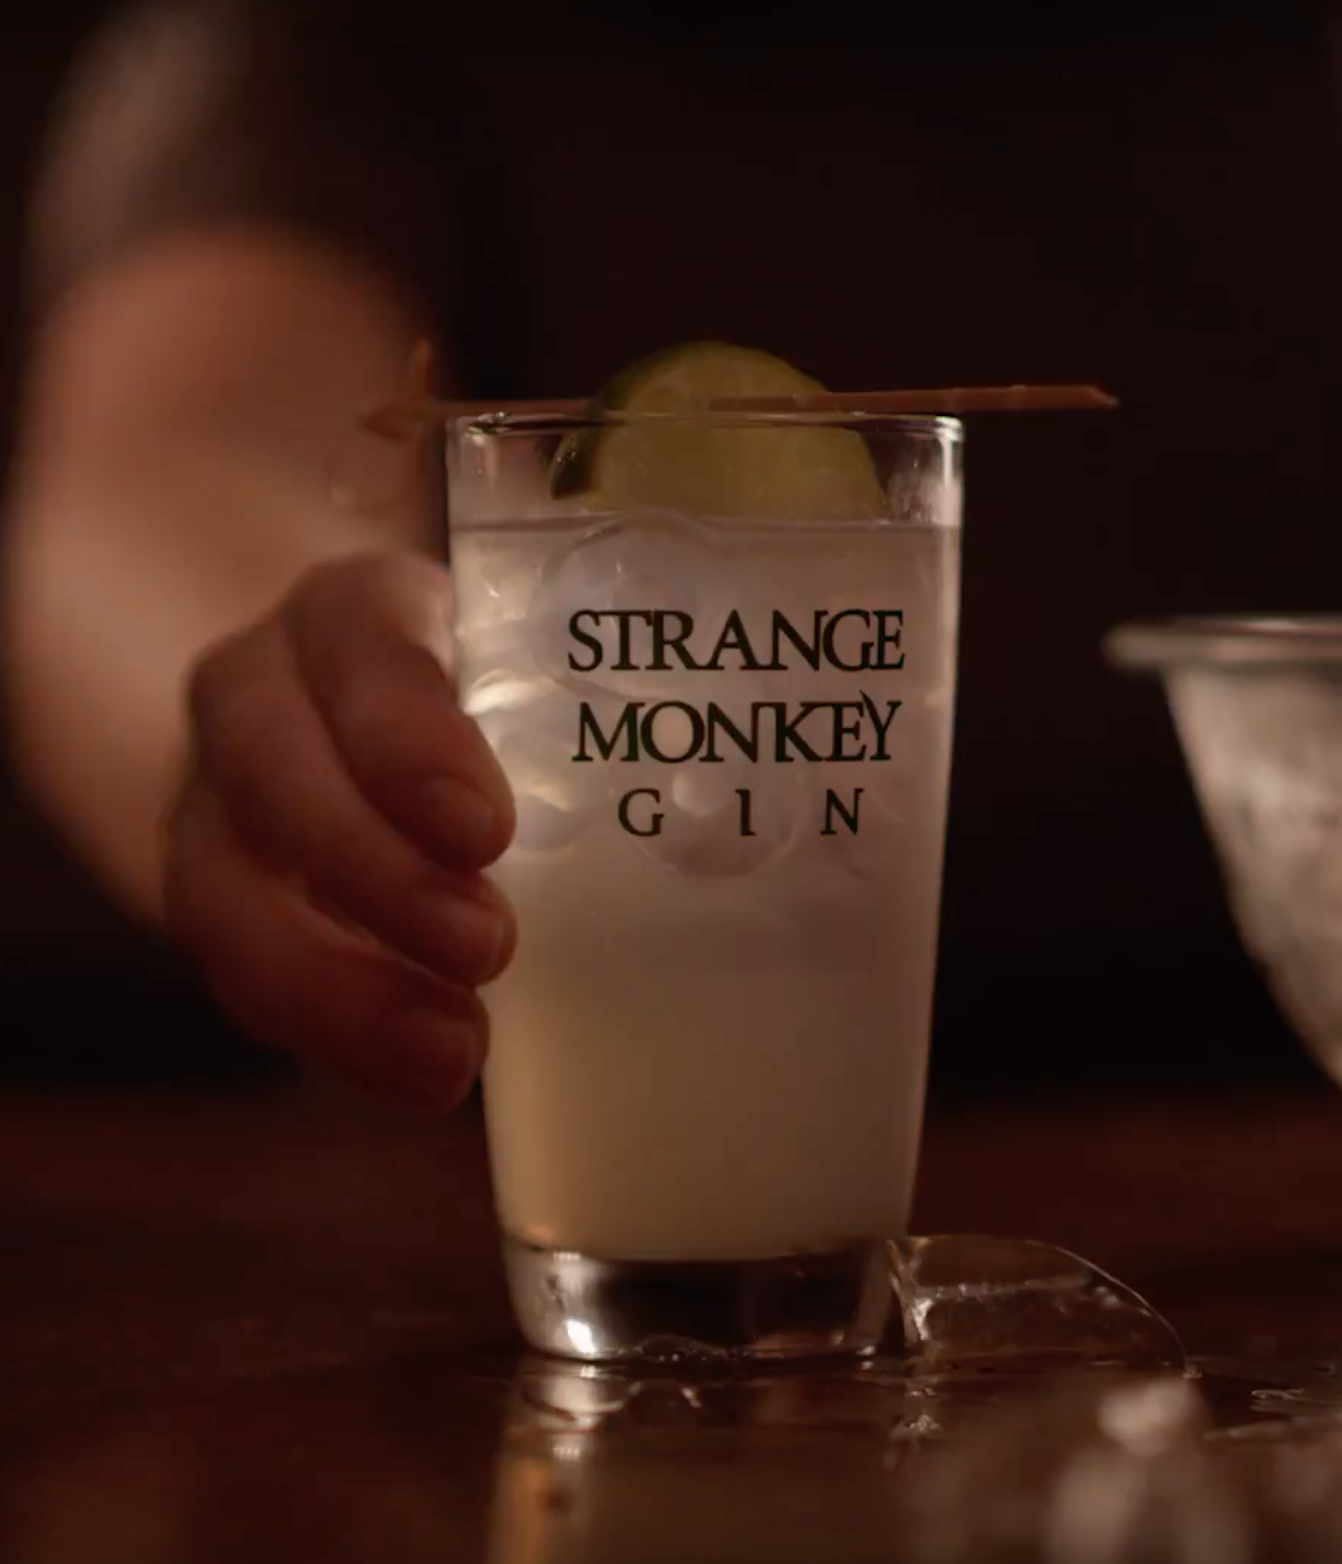 American Spirit: A story of Virginia's liquor laws